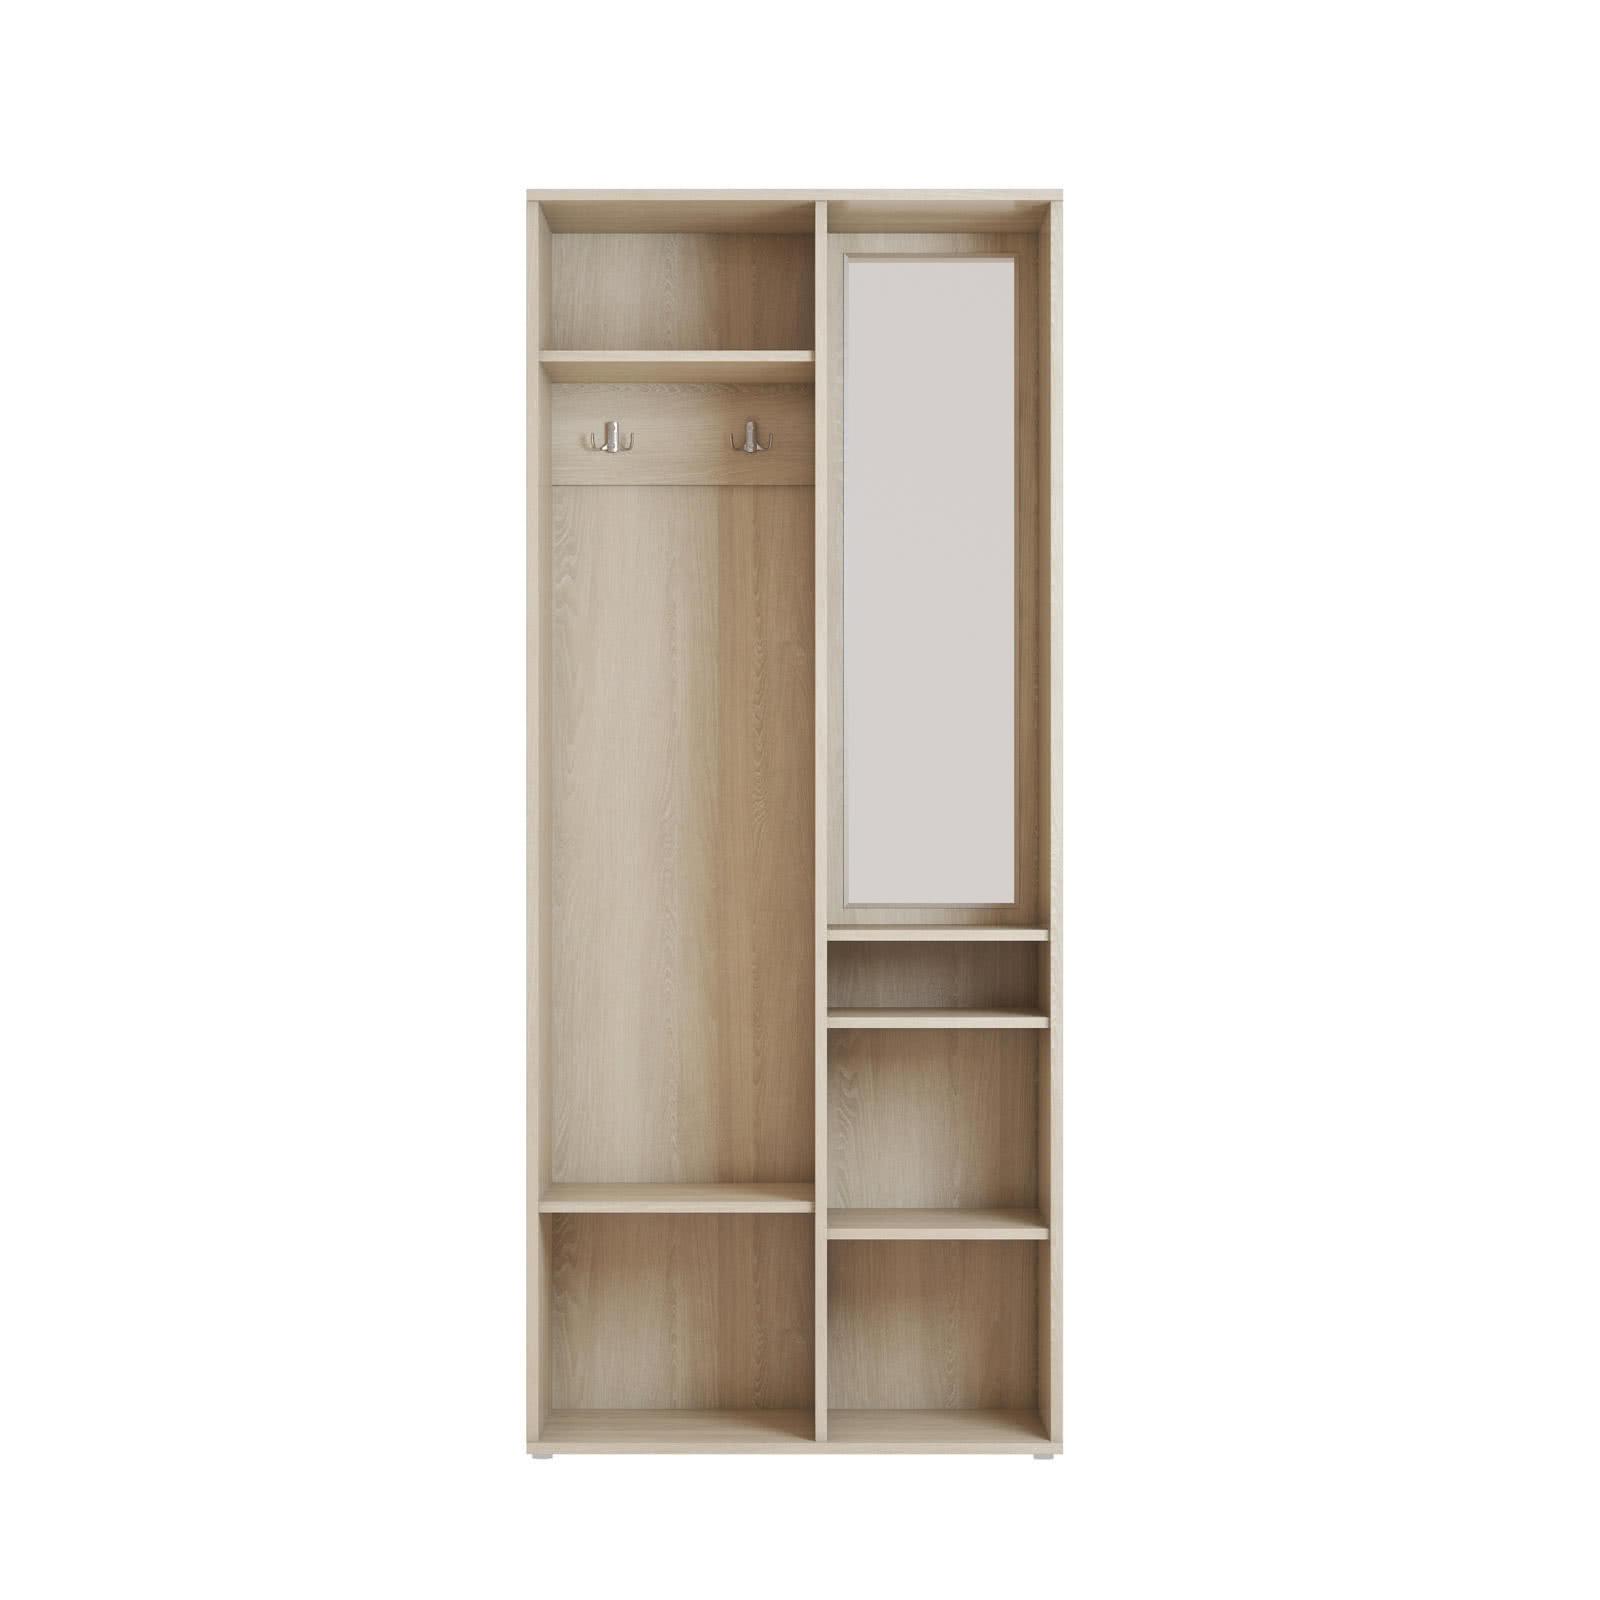 Шкаф комбинированный Брендон